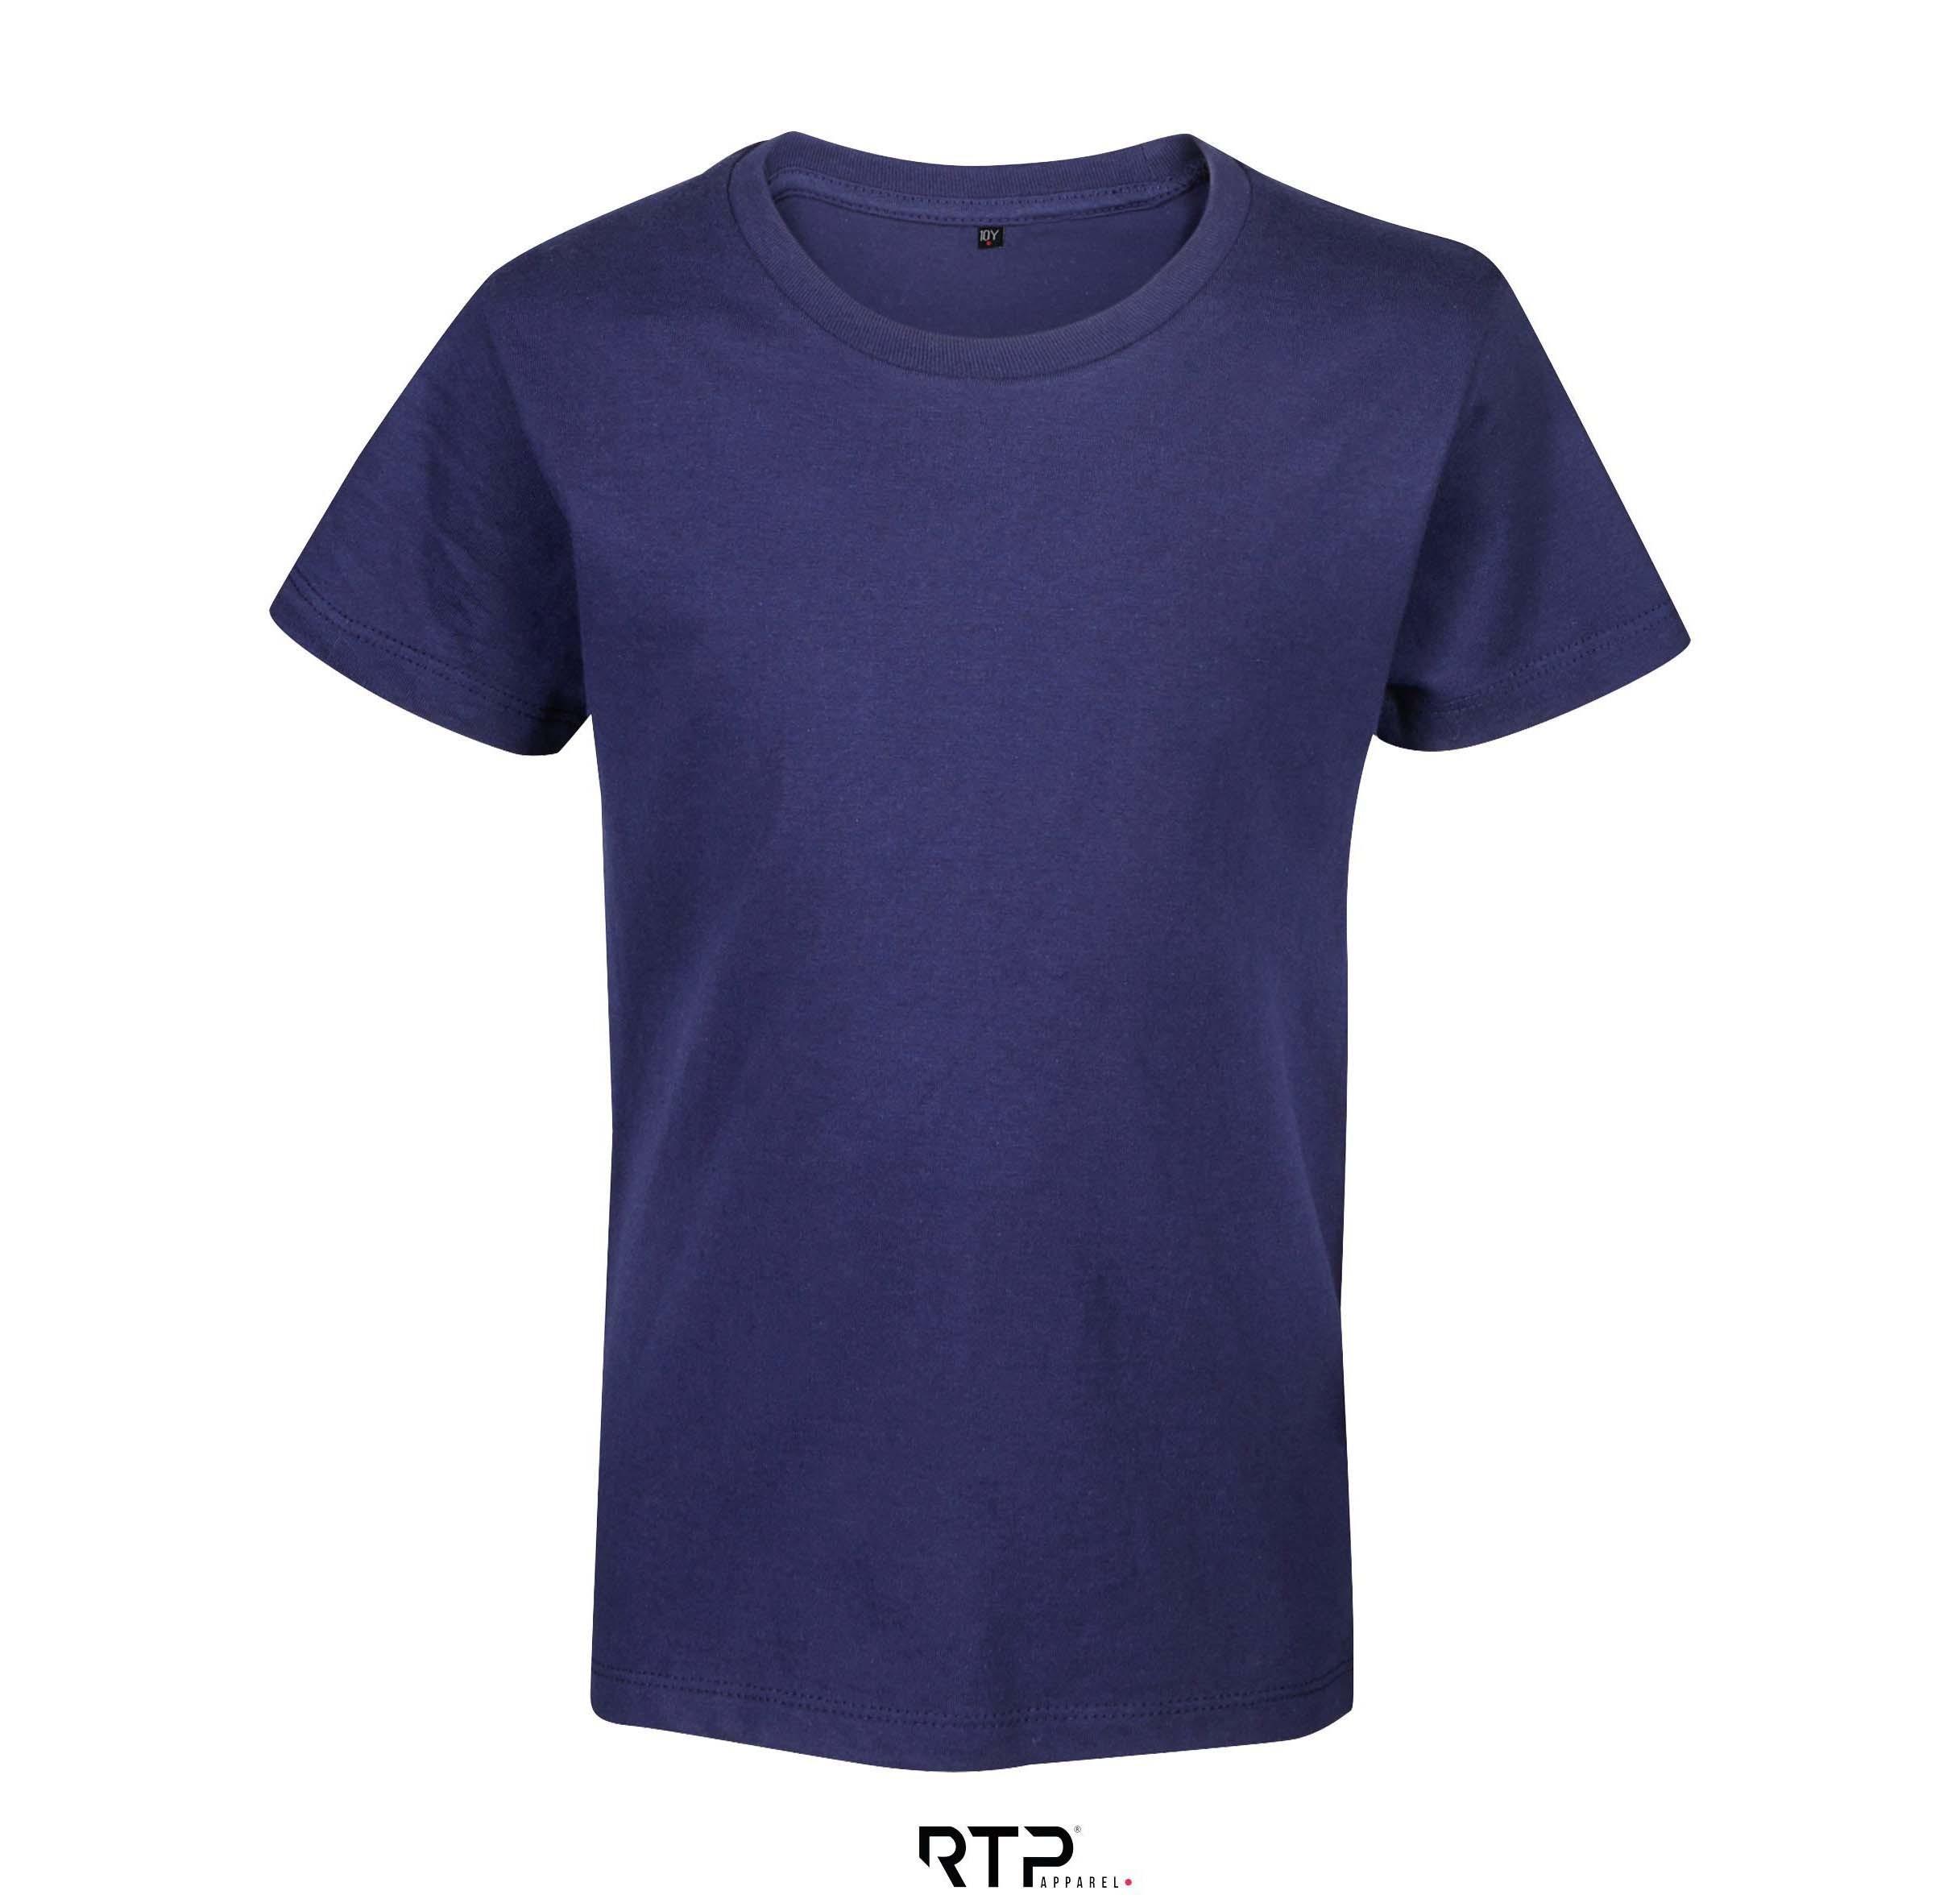 Tee-shirt enfant coupe cousu manches courtes Cosmic 155